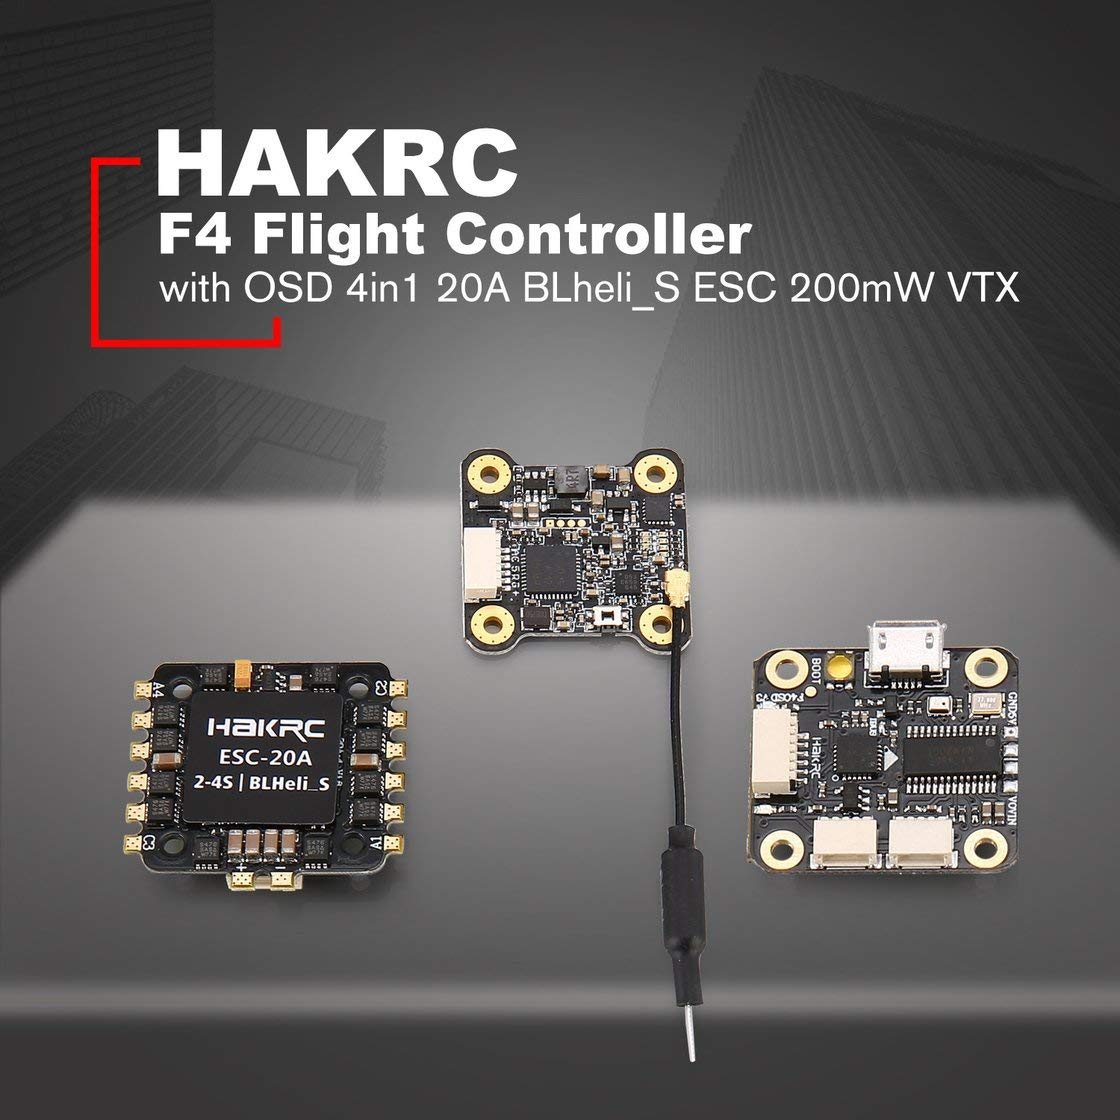 Con Blackpjenny Betaflight Flight Osd Tower Controller F4 Hakrc Bec kPwOn8N0X